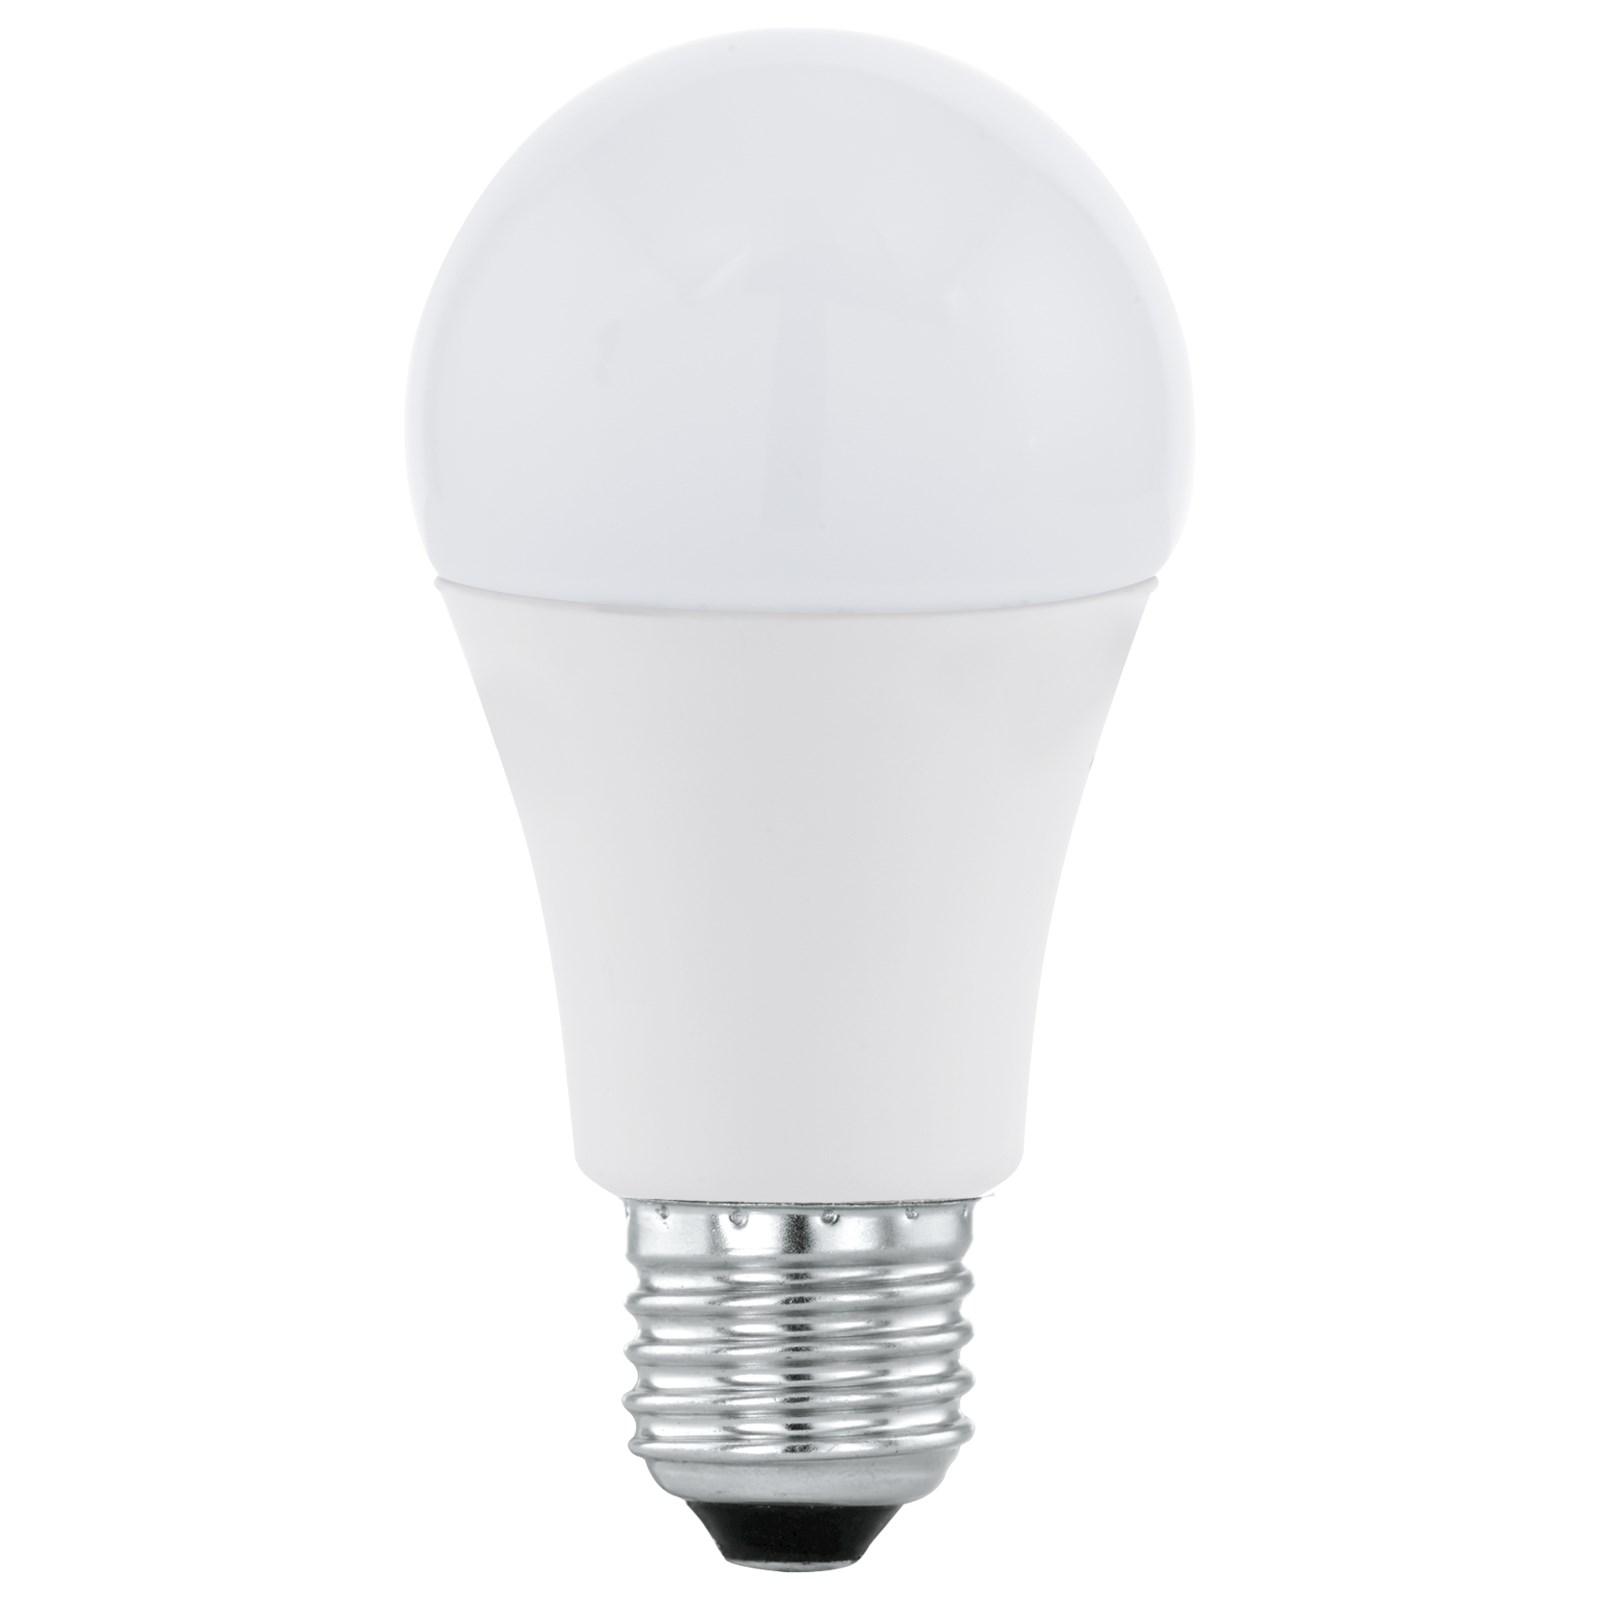 lampe led e27 a60 10 w lampen landi. Black Bedroom Furniture Sets. Home Design Ideas